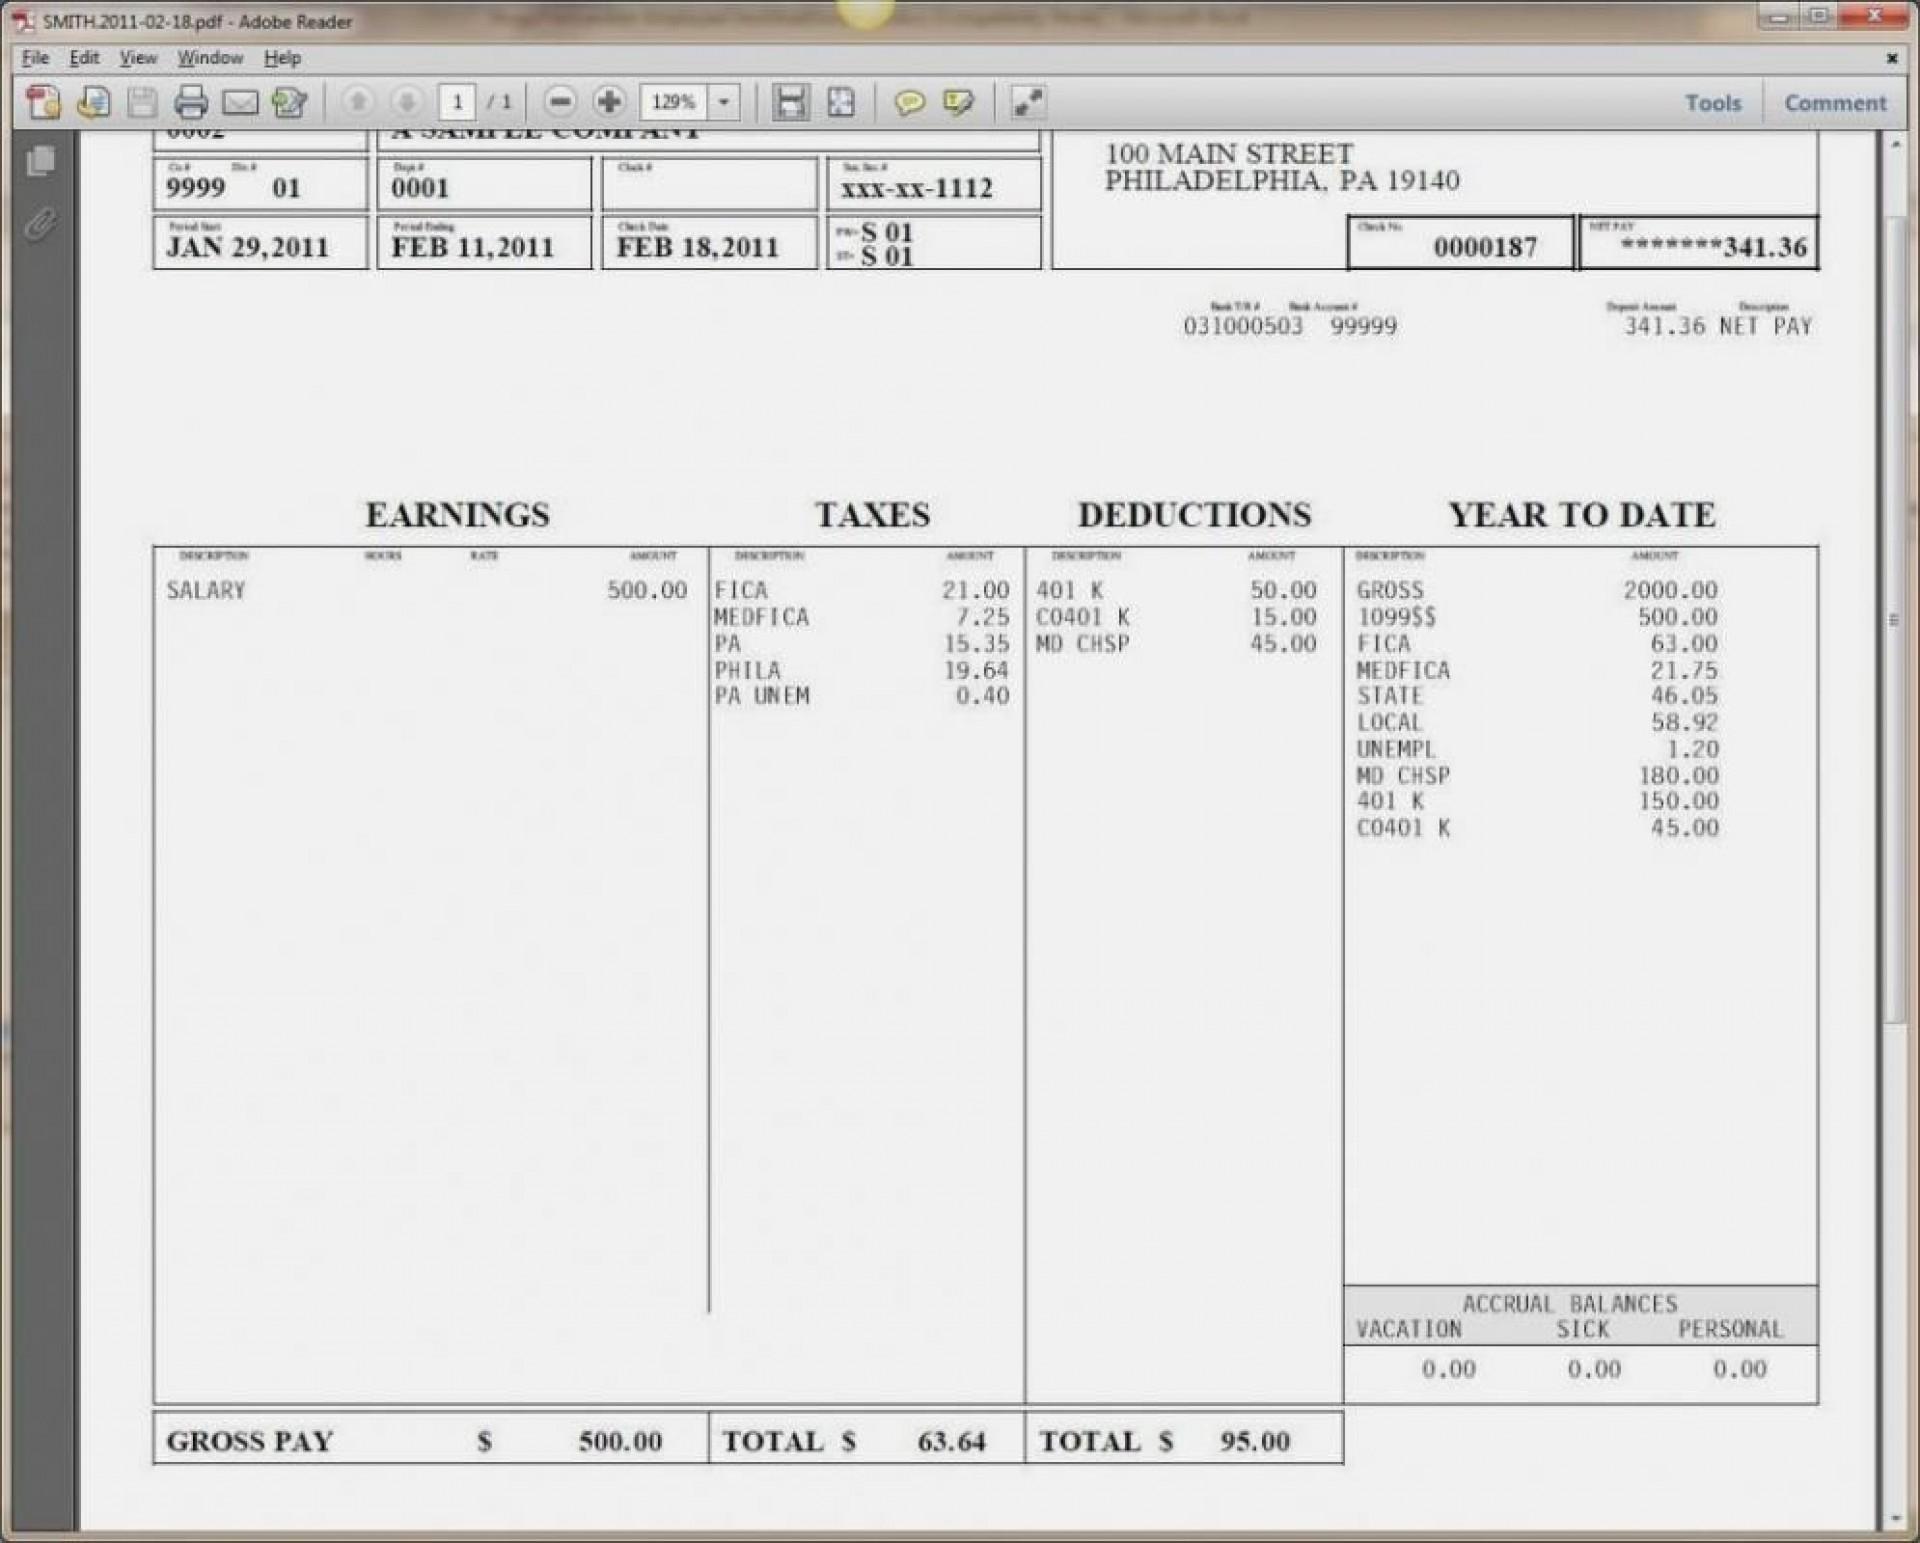 004 Stupendou Pay Stub Template Word Photo  Document Check Microsoft Free1920